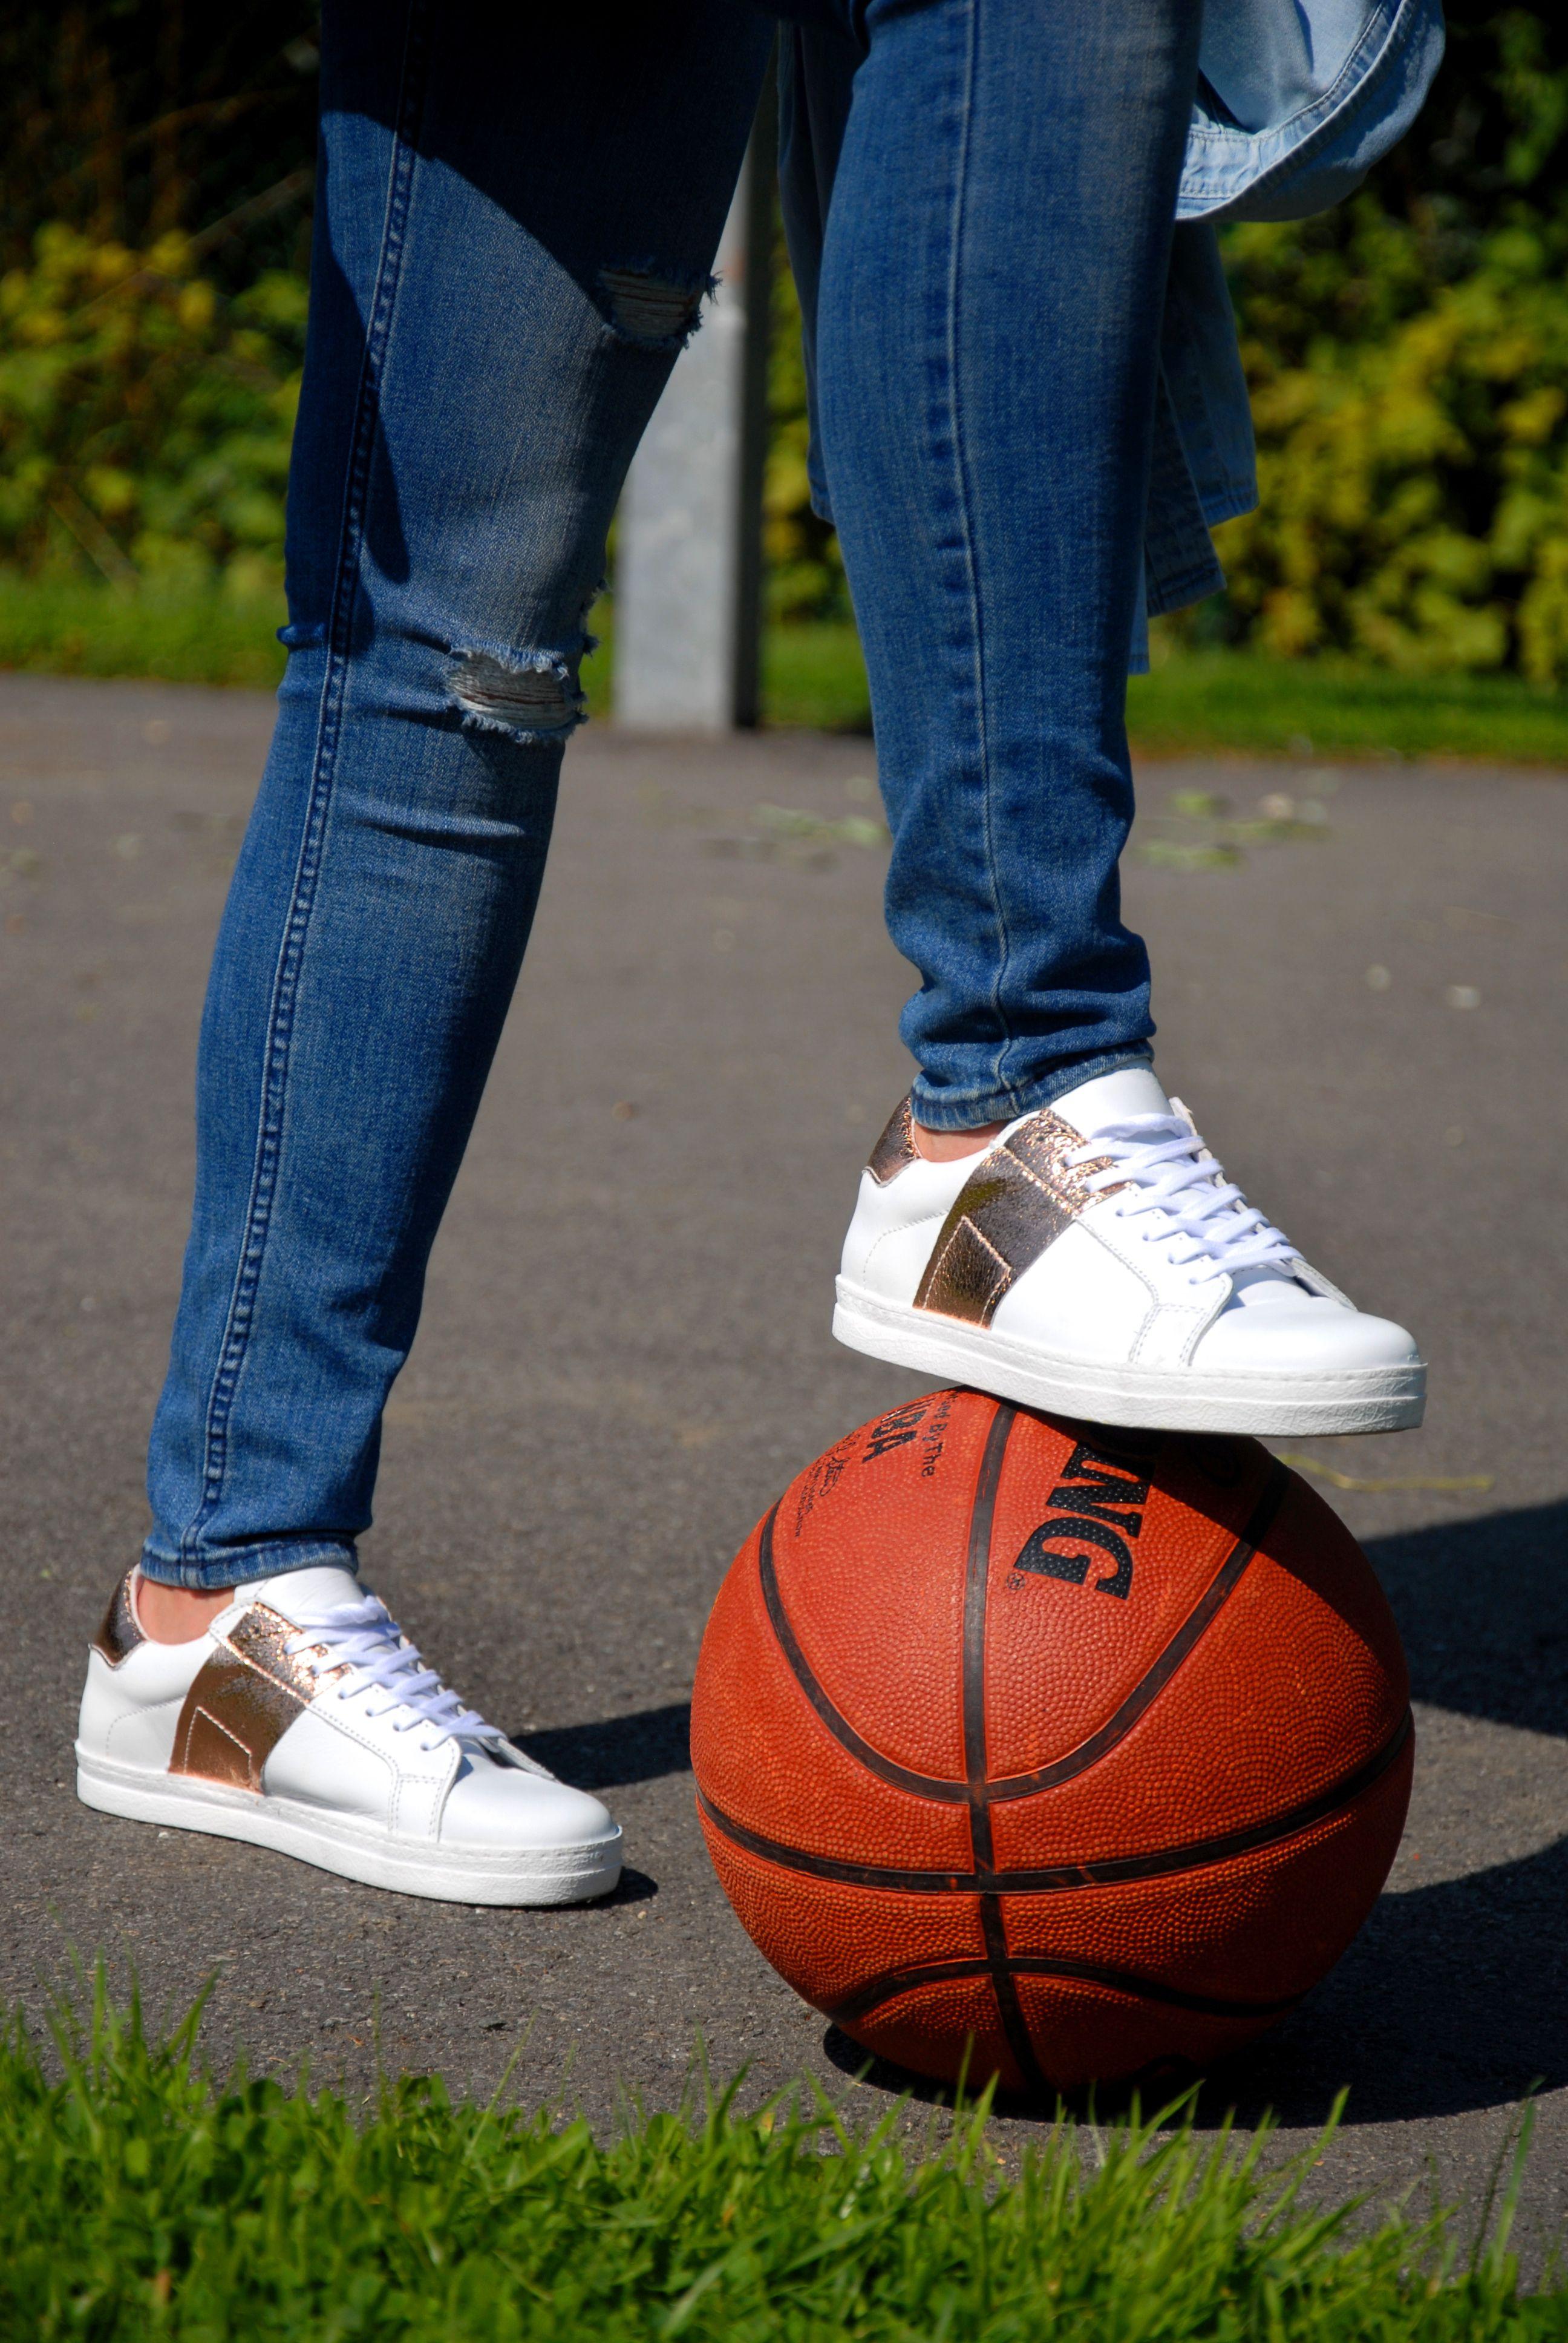 Kickers #sneakers wit | Brantano.be